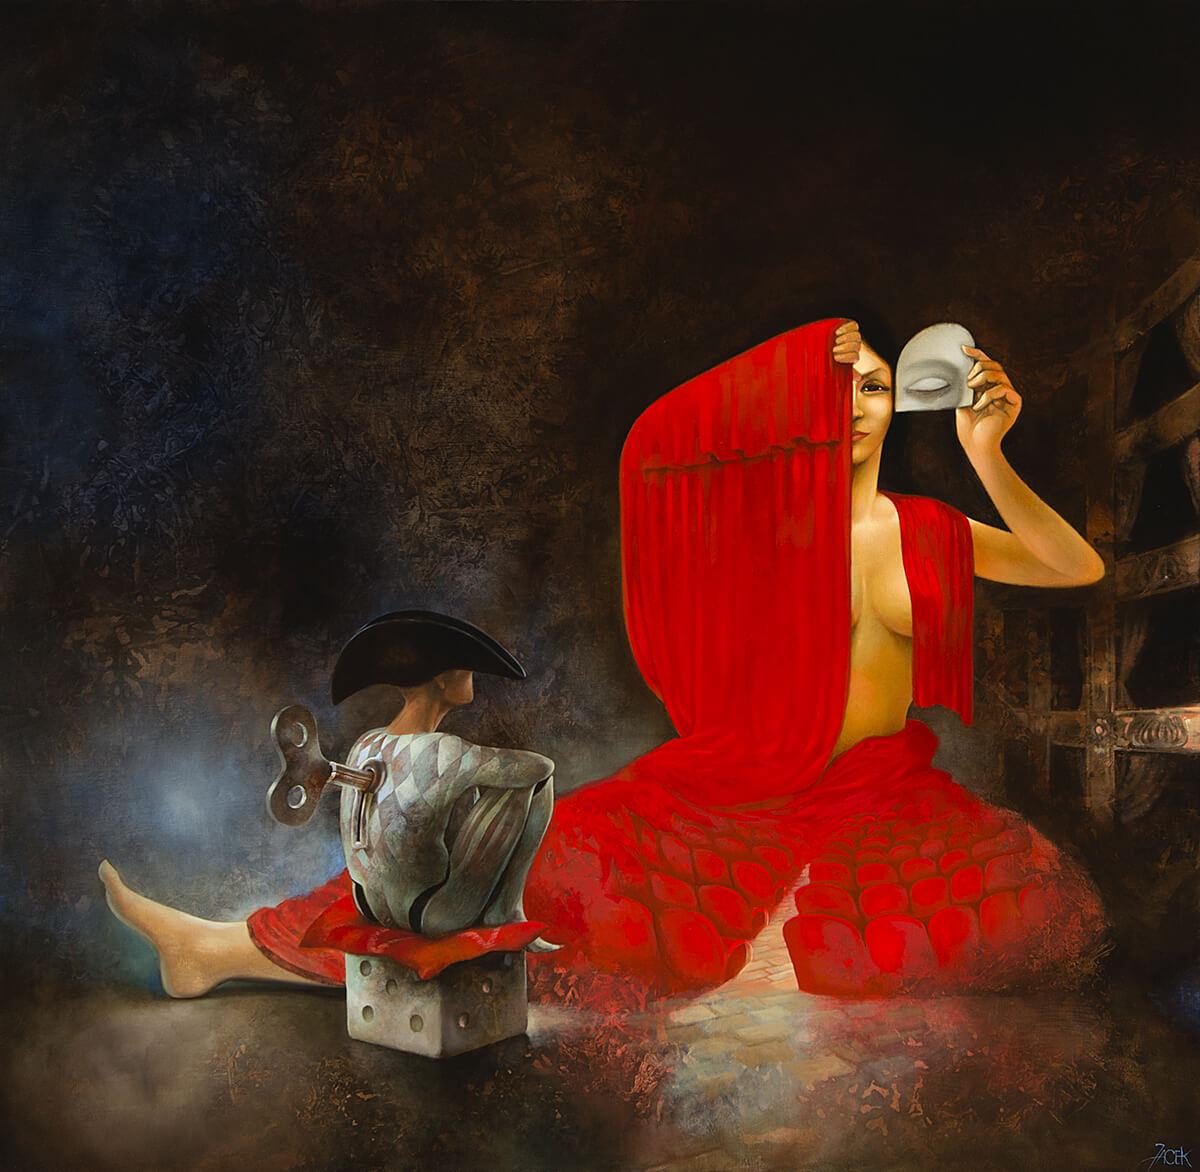 oil on canvas, 100 x 100 cm, 2015